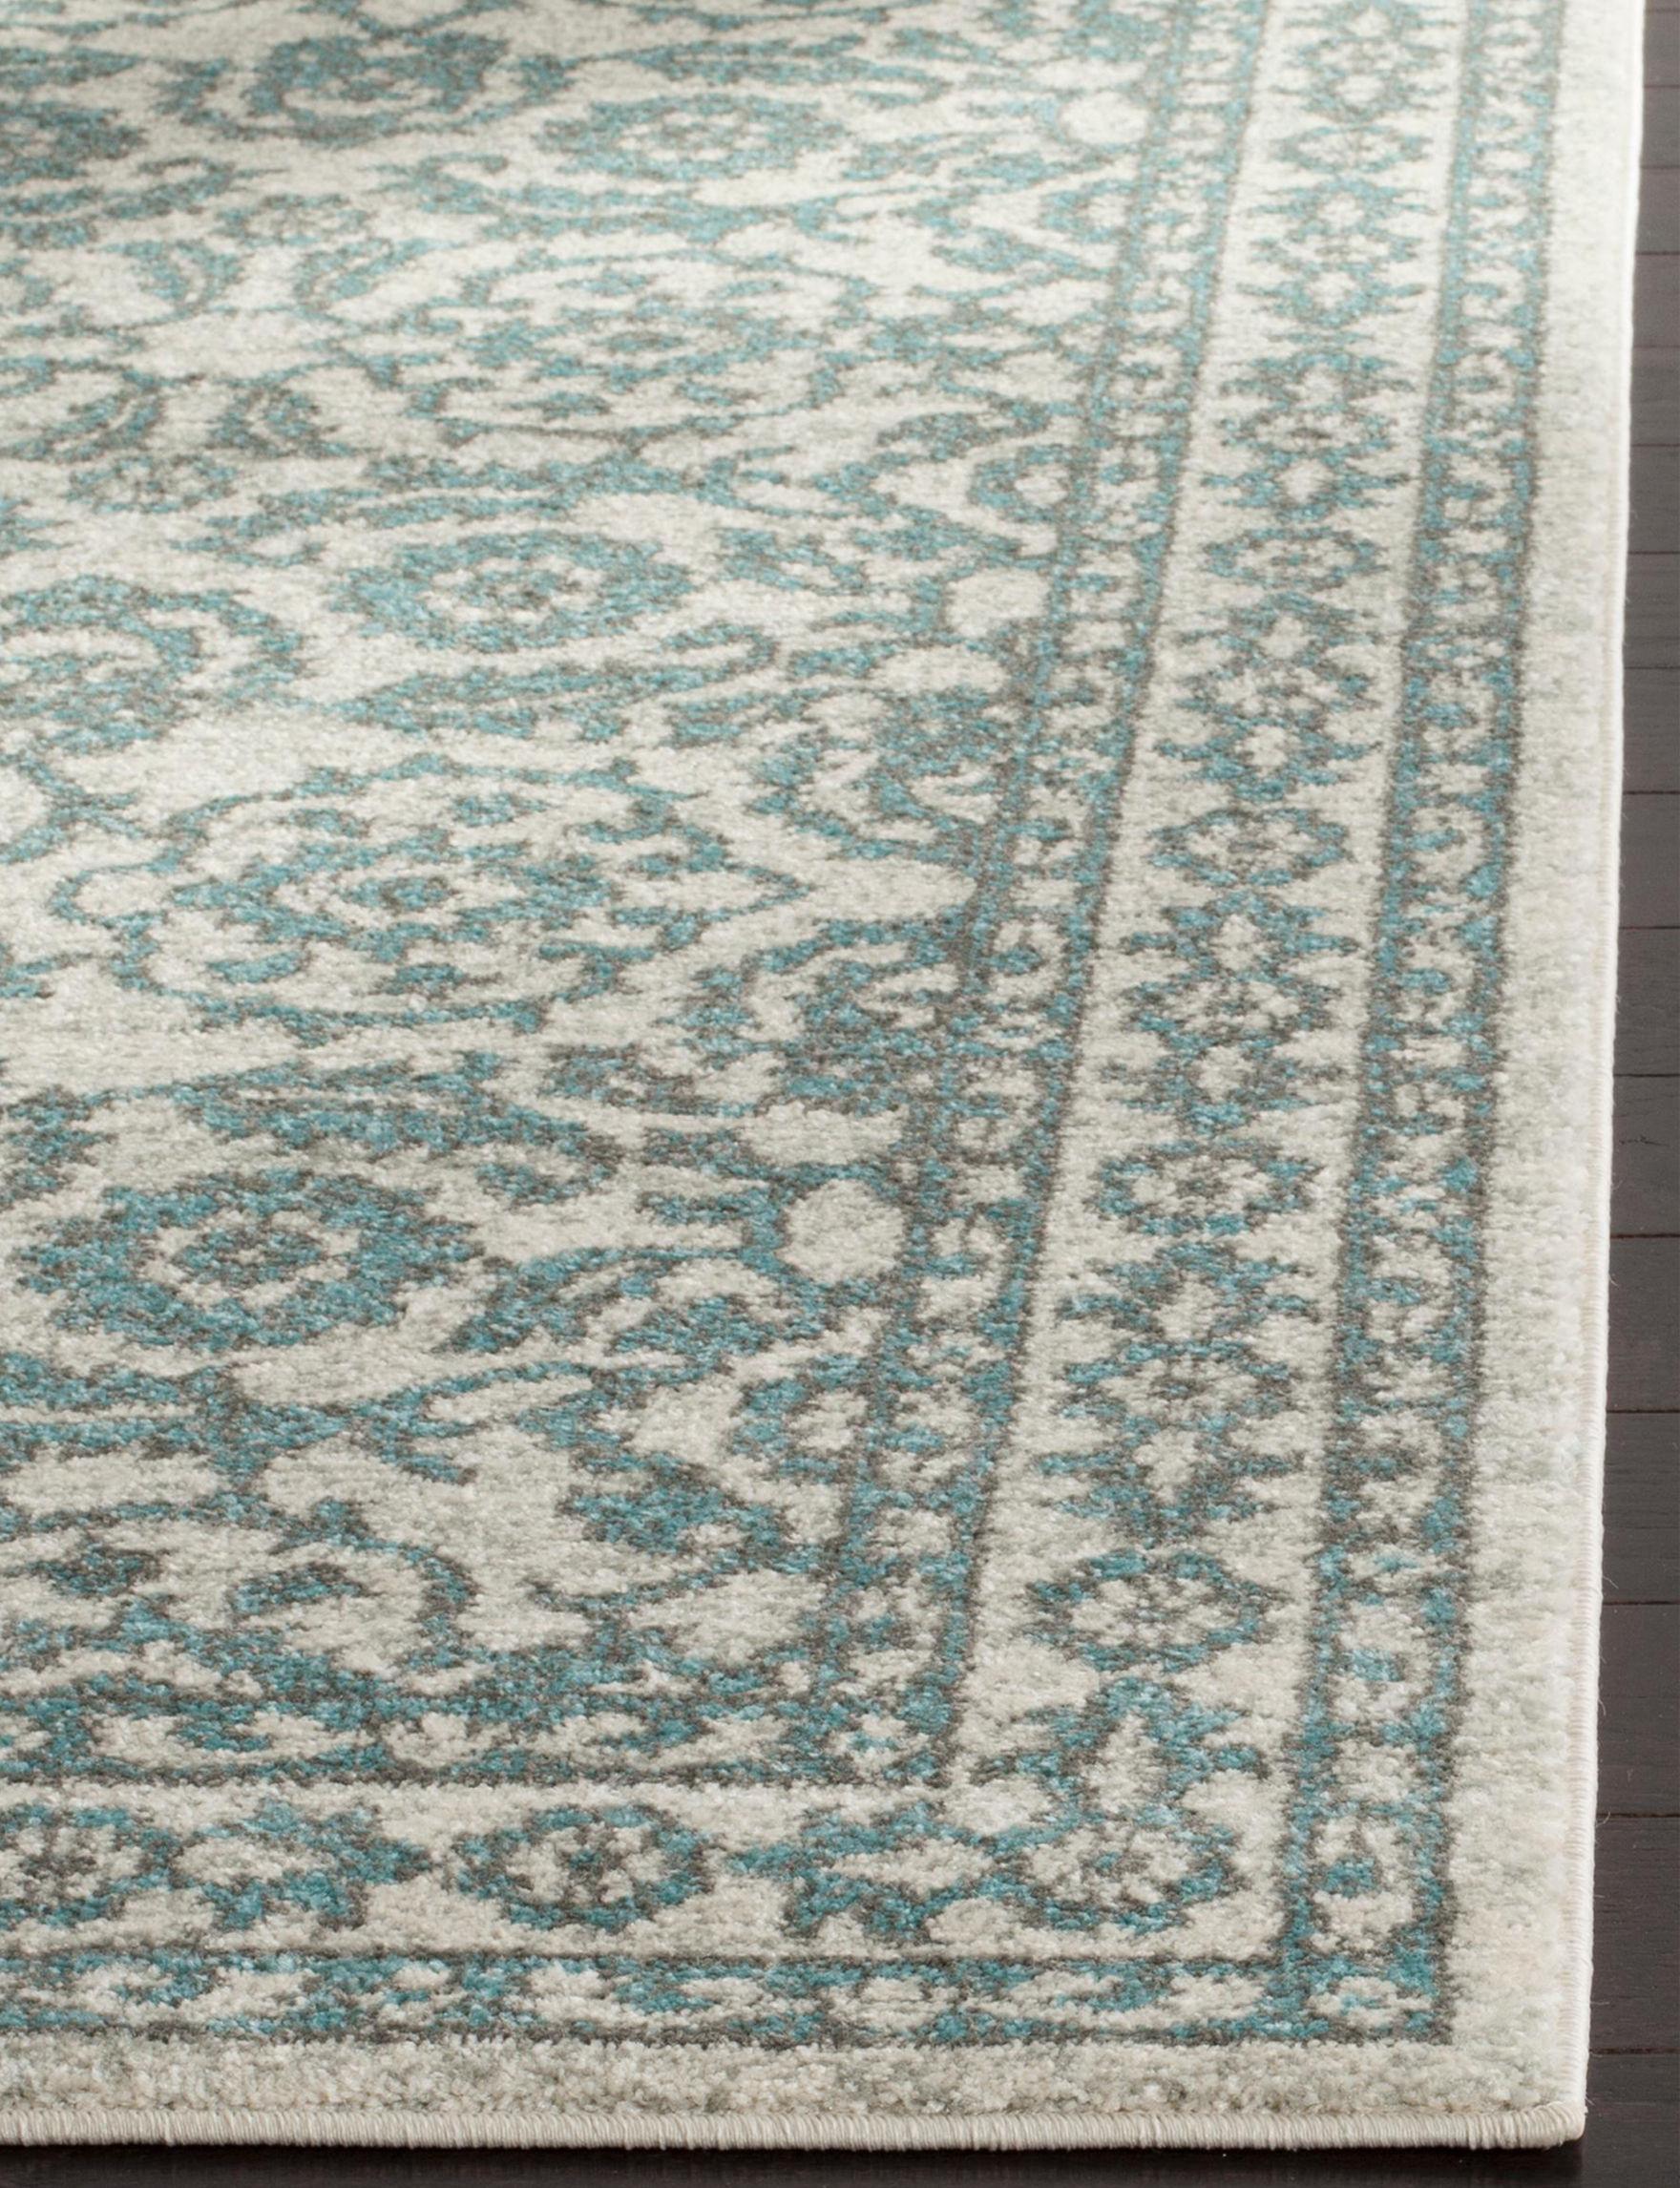 Safavieh Ivory / Grey Area Rugs Rugs